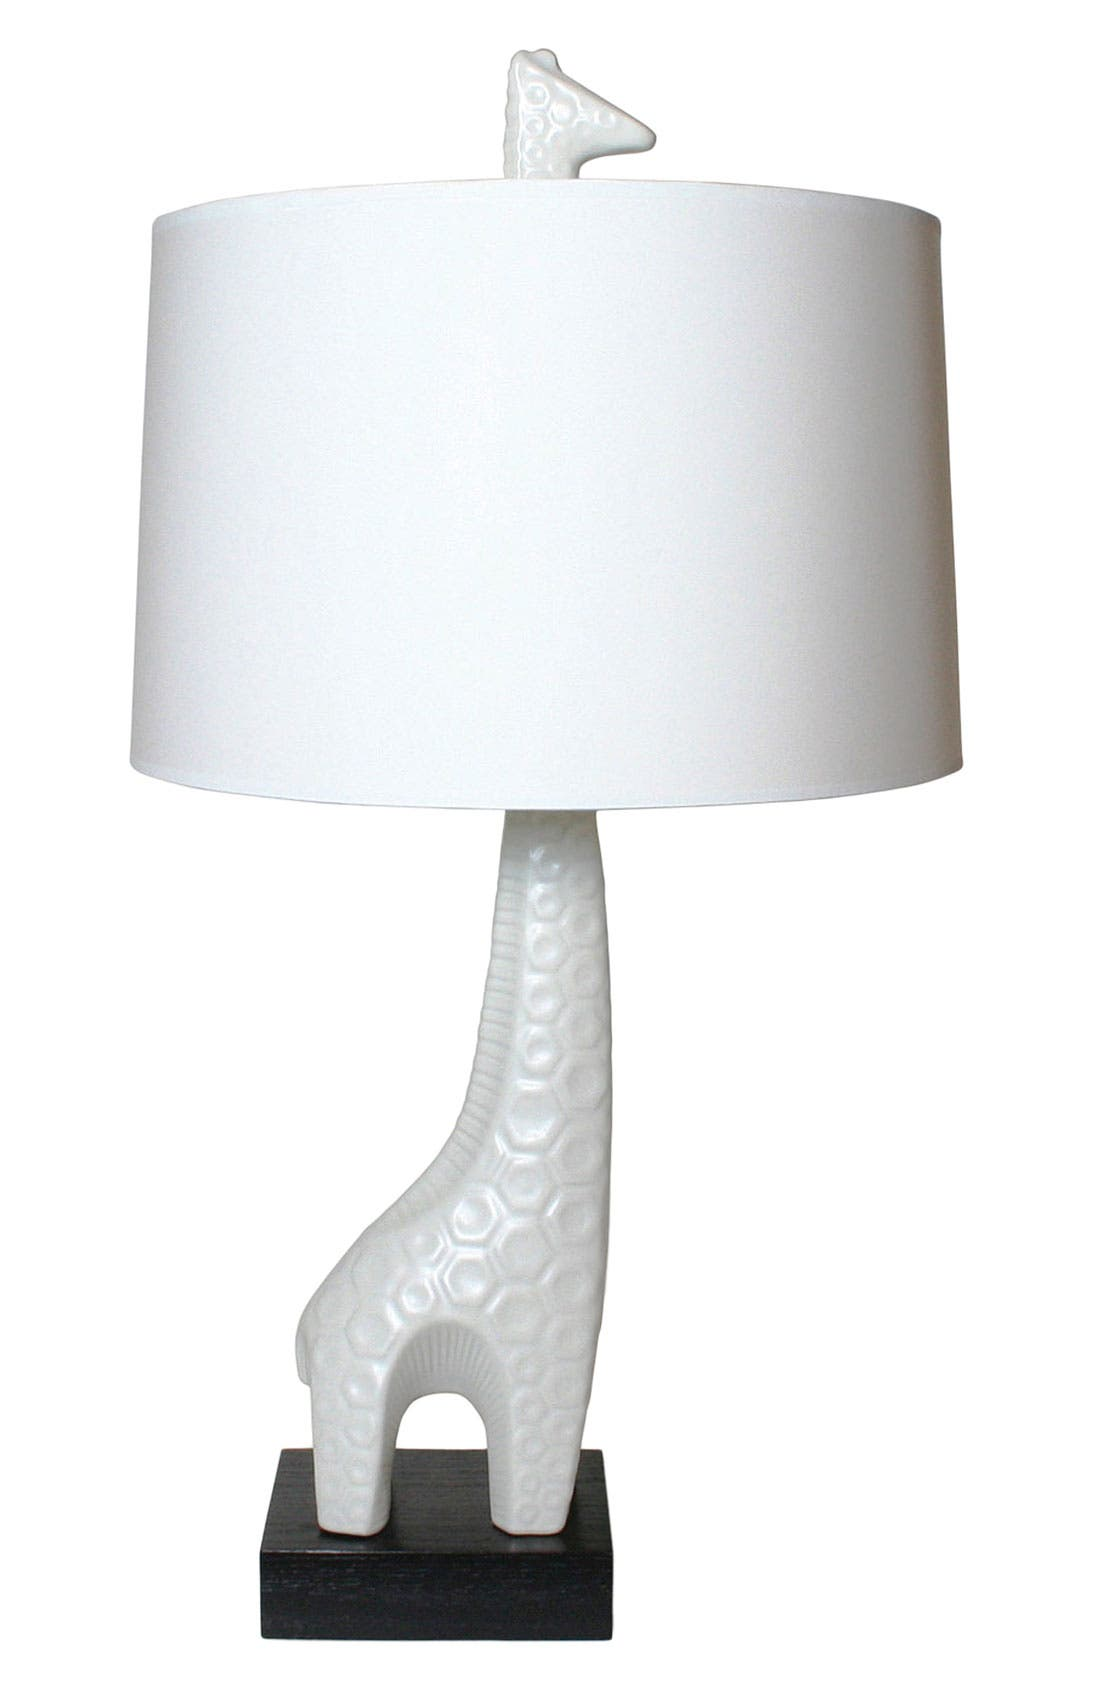 Main Image - Jonathan Adler 'Giraffe' Lamp